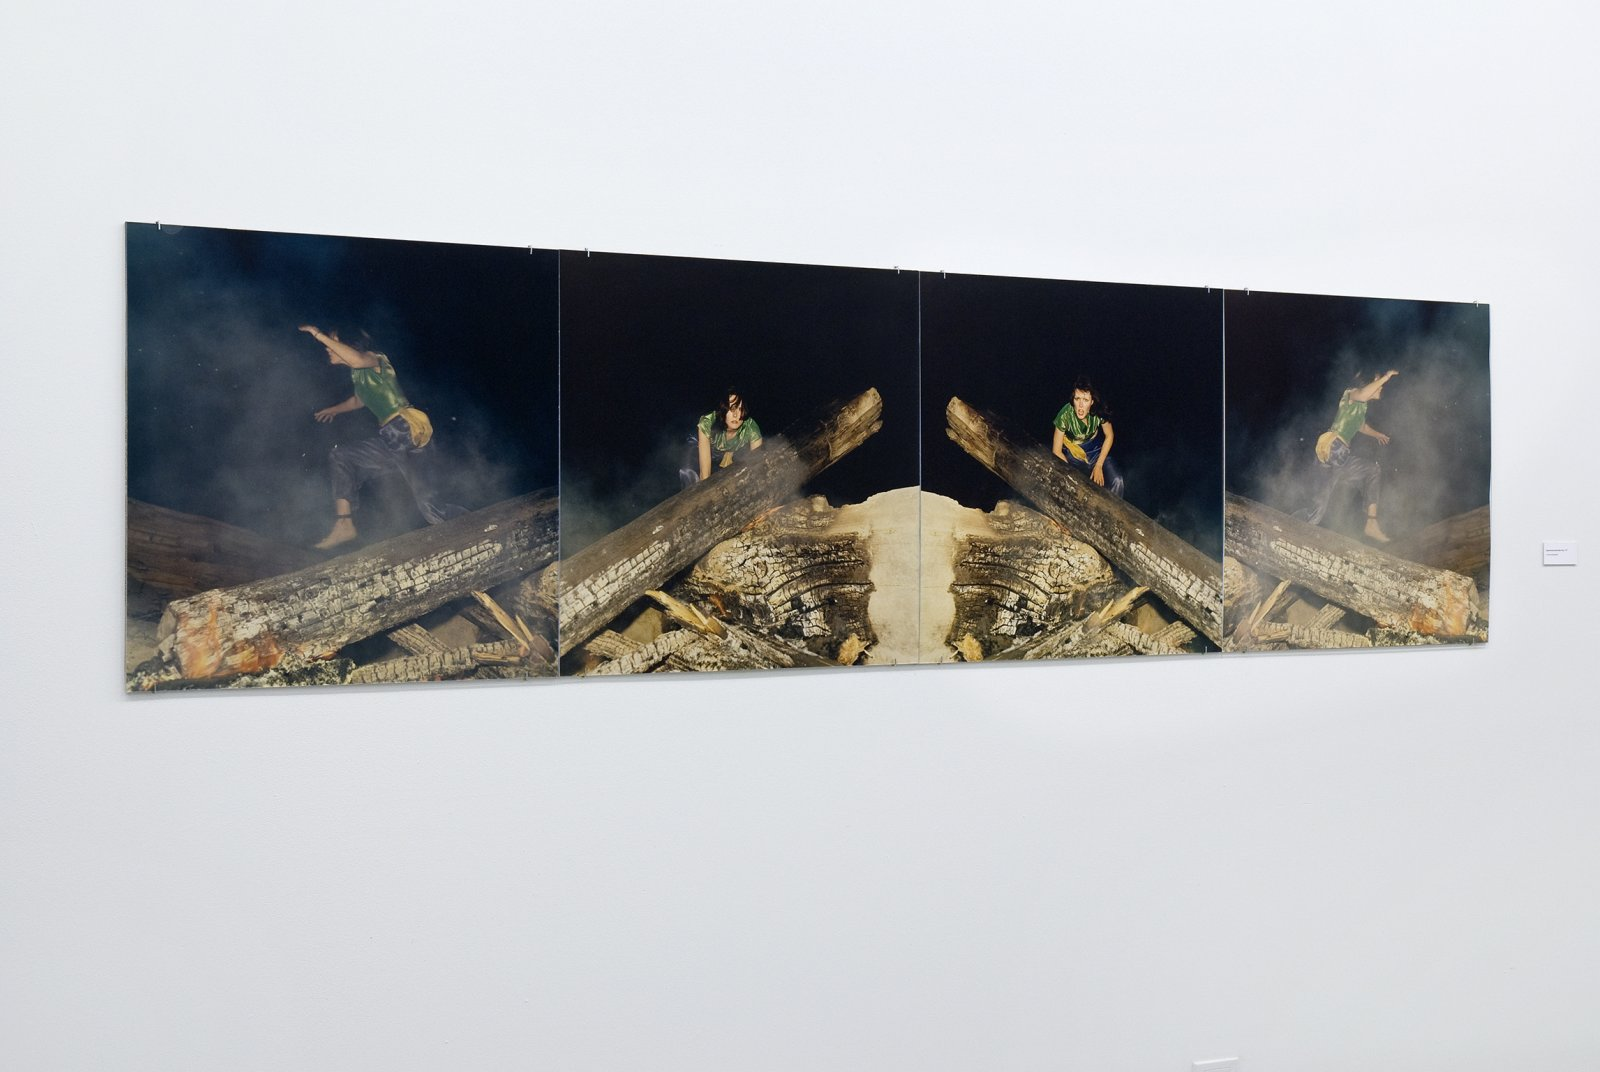 Ian Wallace, Hypnerotomachia (the Fire), 1977, 4 c-prints, 29 x 116 in. (74 x 295 cm) by Ian Wallace